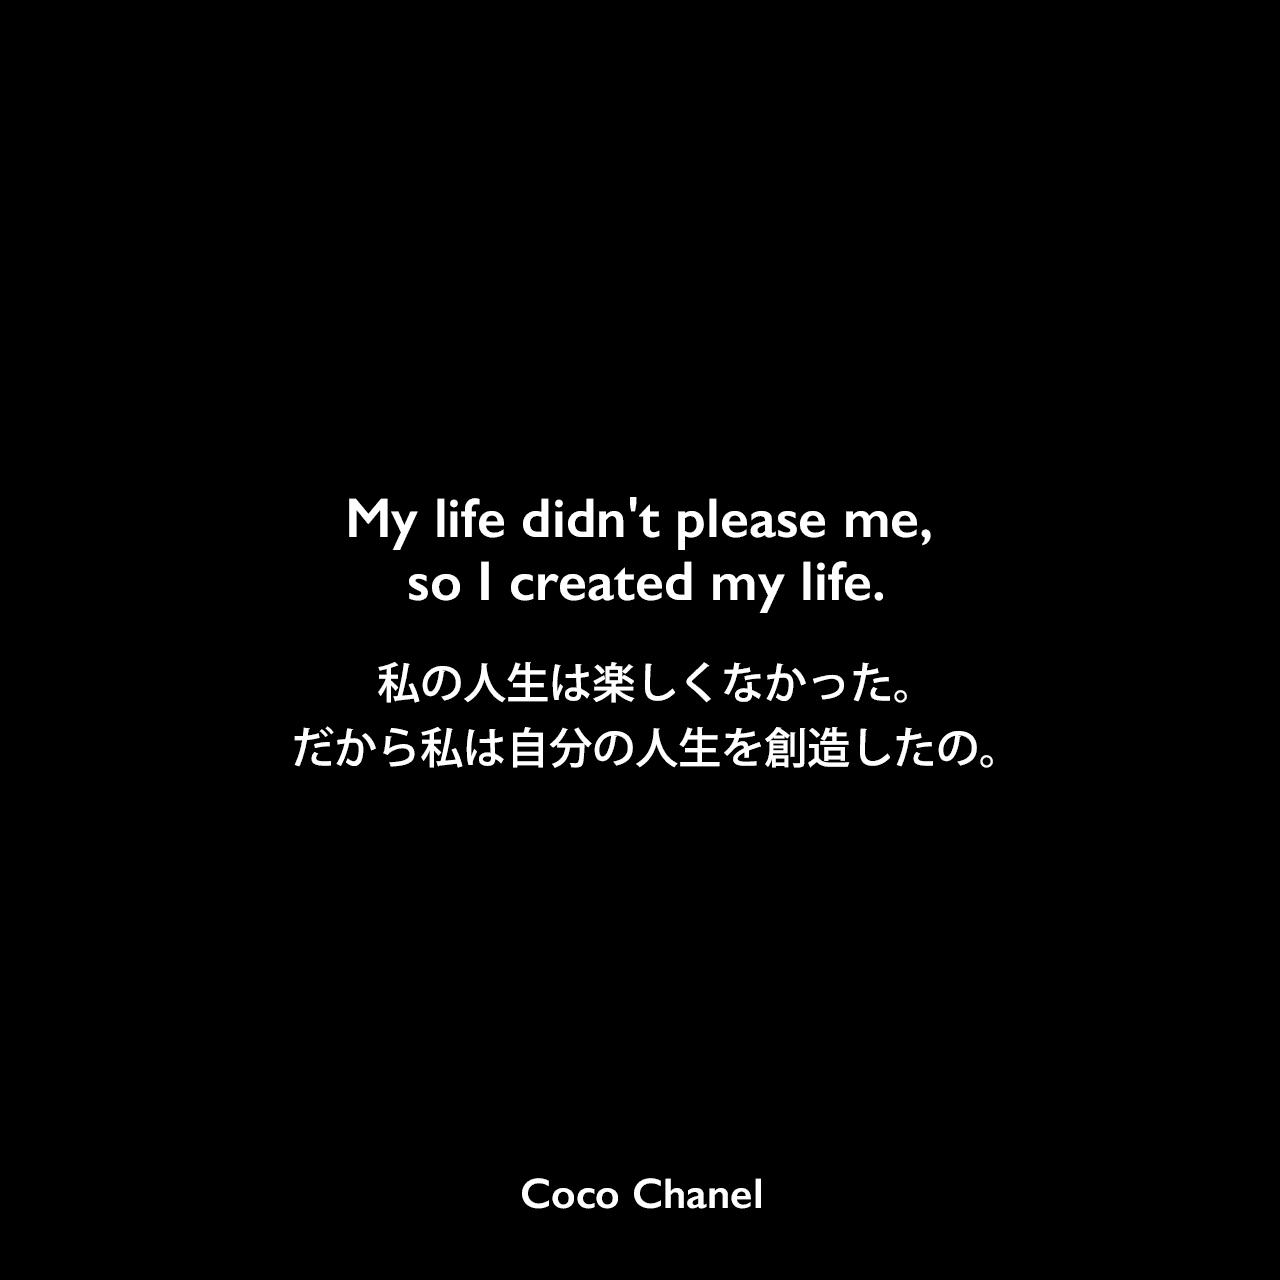 My life didn't please me, so I created my life.私の人生は楽しくなかった。だから私は自分の人生を創造したの。Coco Chanel